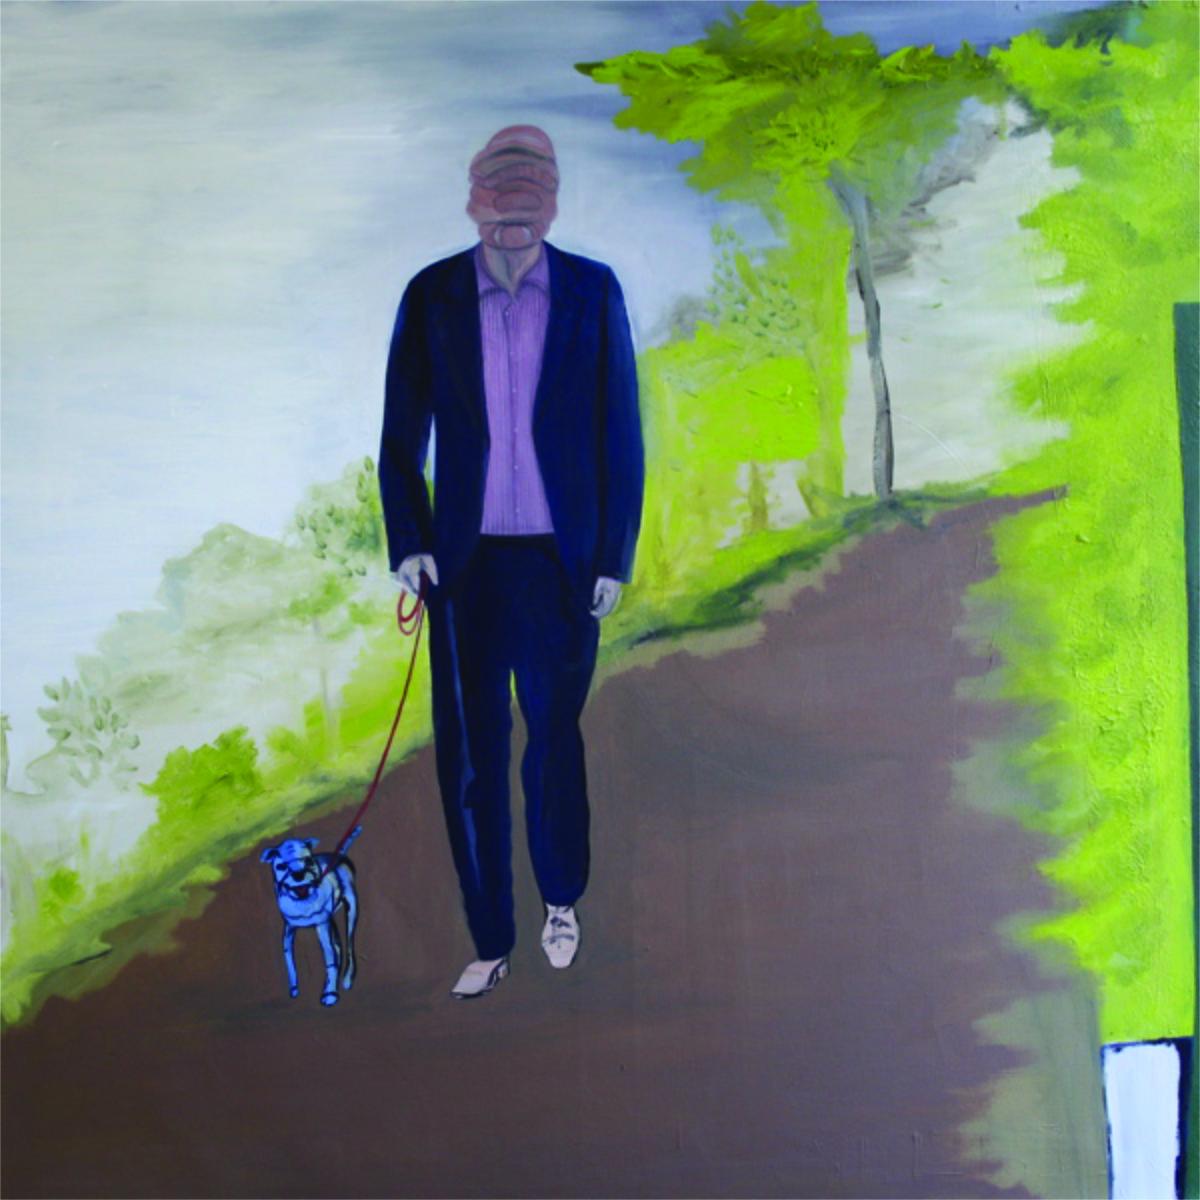 """Spaziergang mit Hund"", Öl auf Leinwand, 100 cm x 100 cm, Preis: 2800.- Euro"